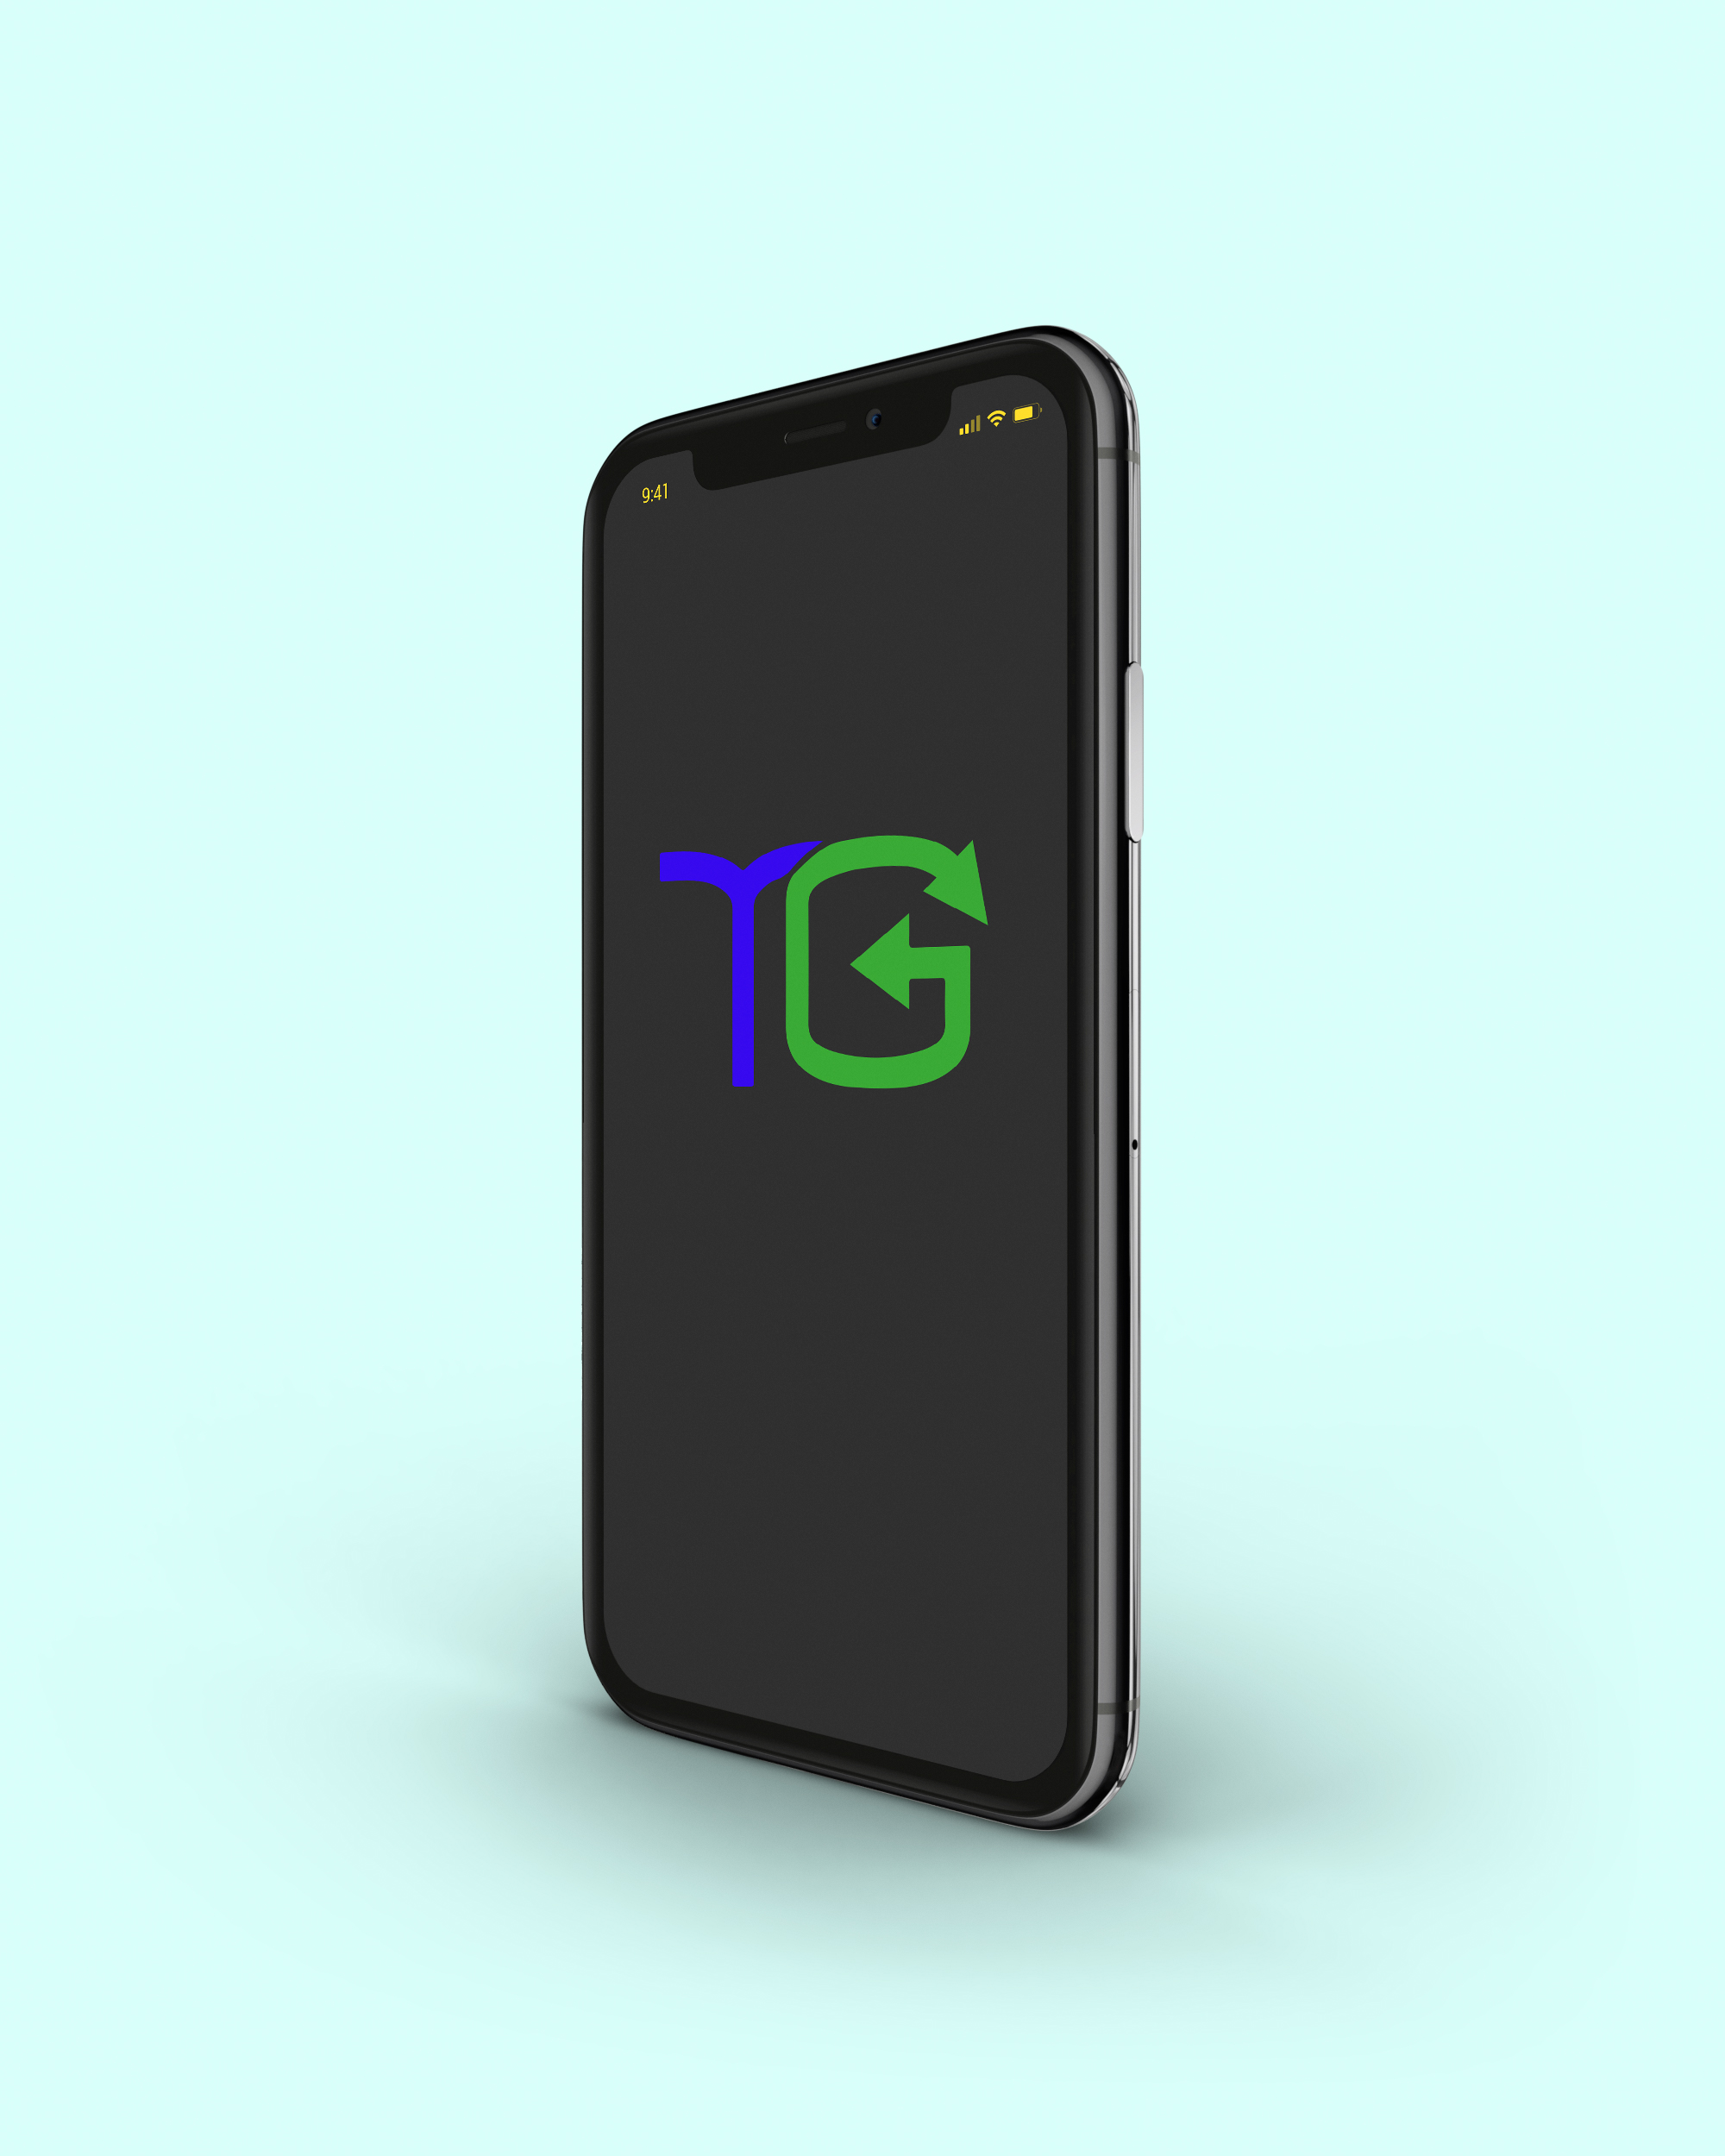 Разработать логотип и экран загрузки приложения фото f_0845aab9c38c02bc.jpg